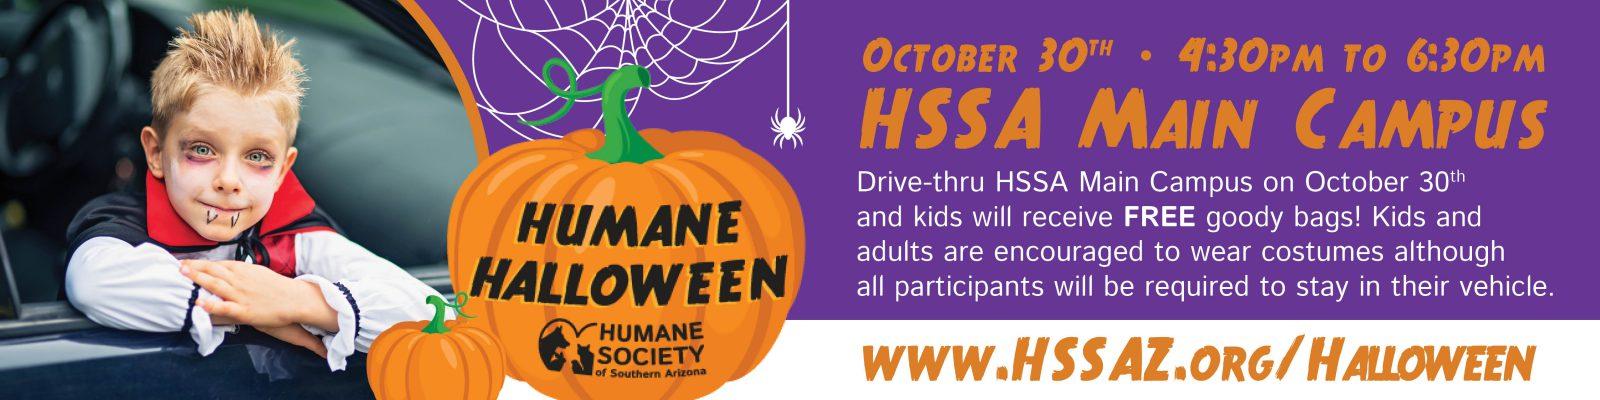 Humane Halloween- Email Banner